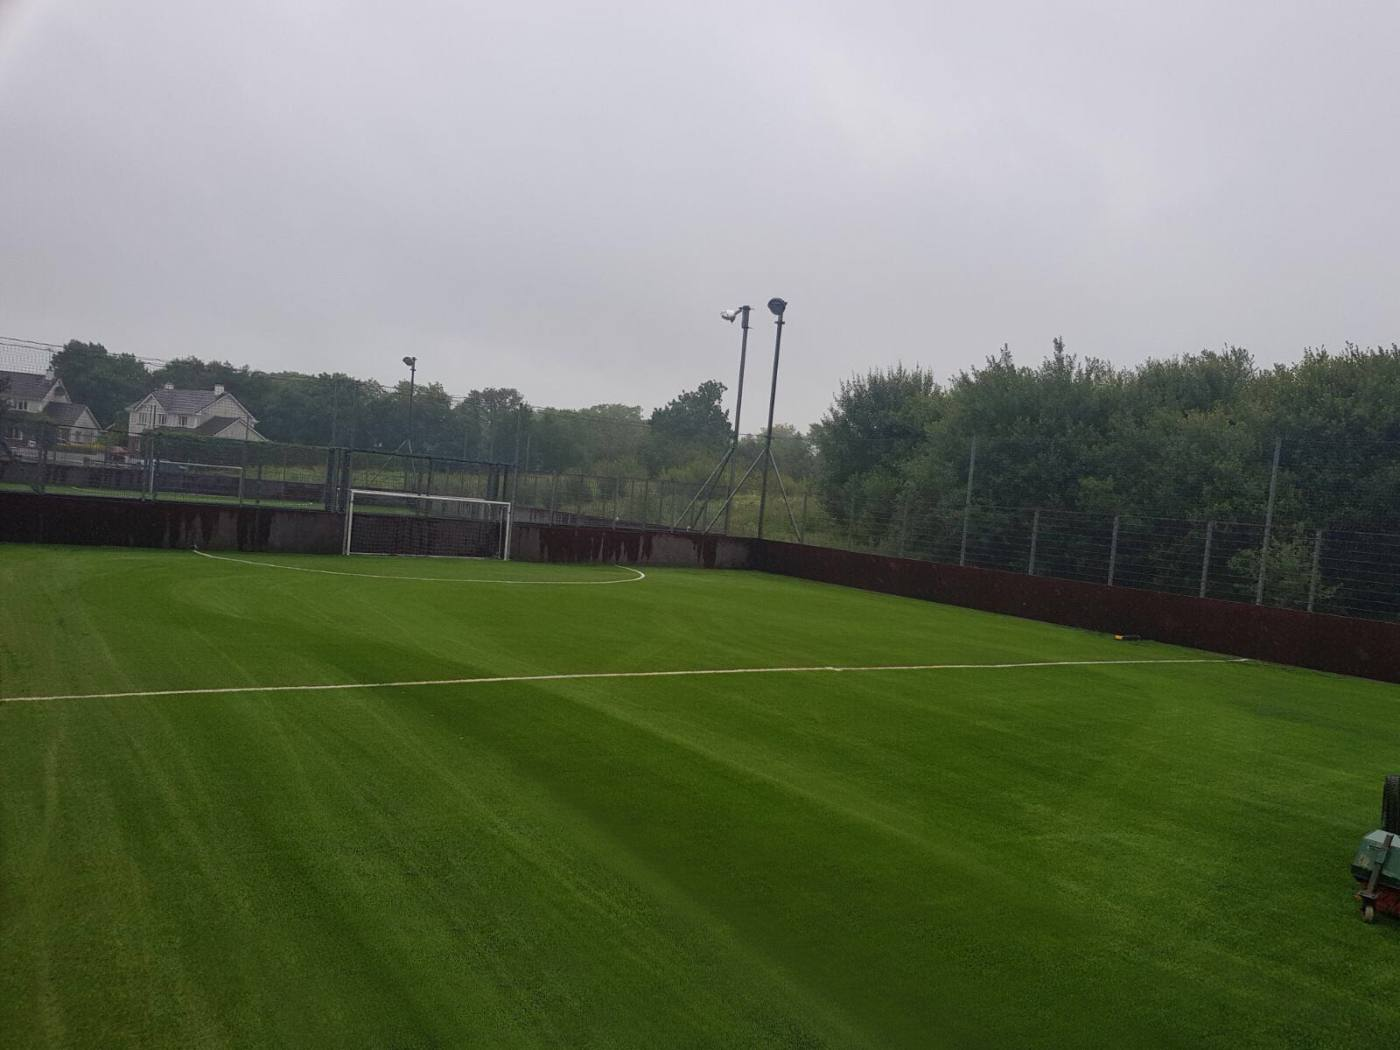 Astroturf pitch at Aura Leisure Centre, Co Leitrim